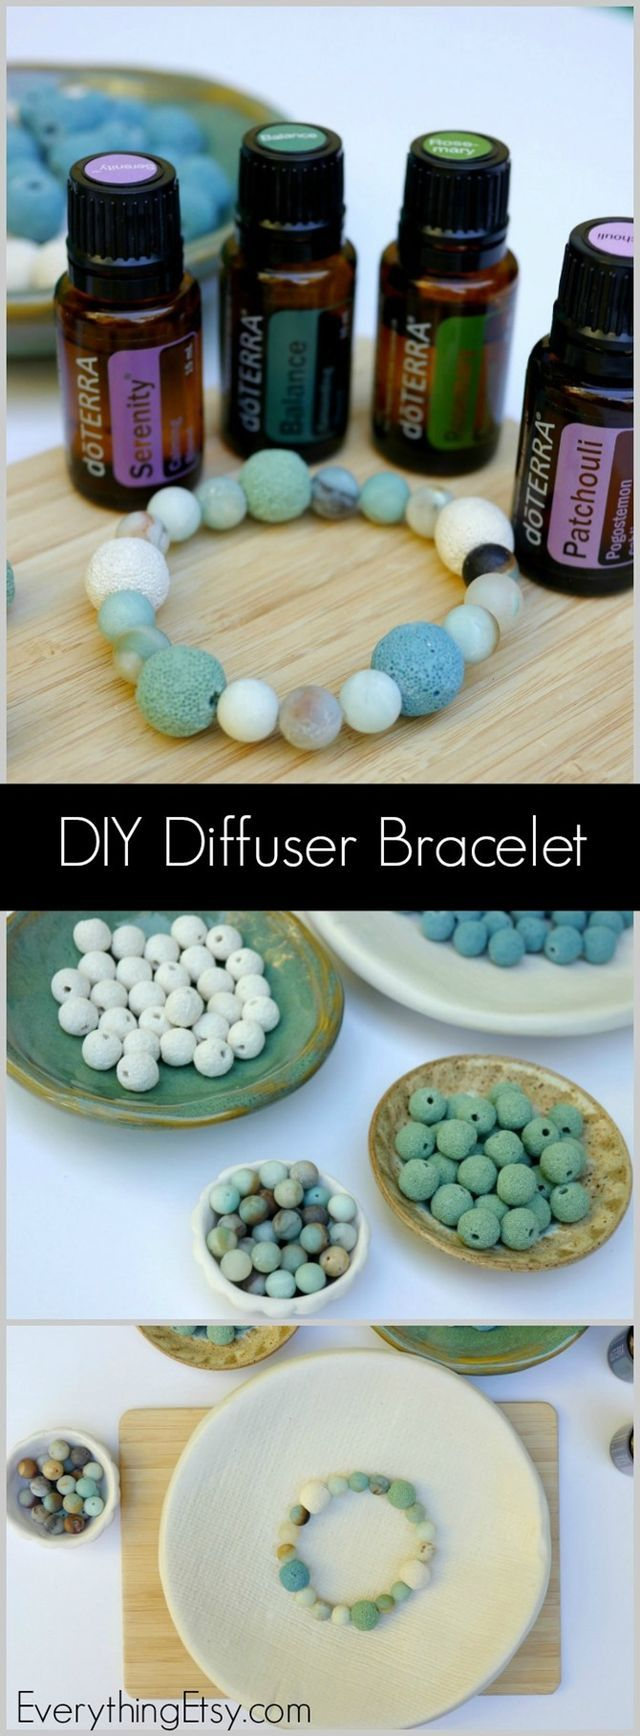 The 25+ best Diy oil diffuser jewelry ideas on Pinterest | Diy ...